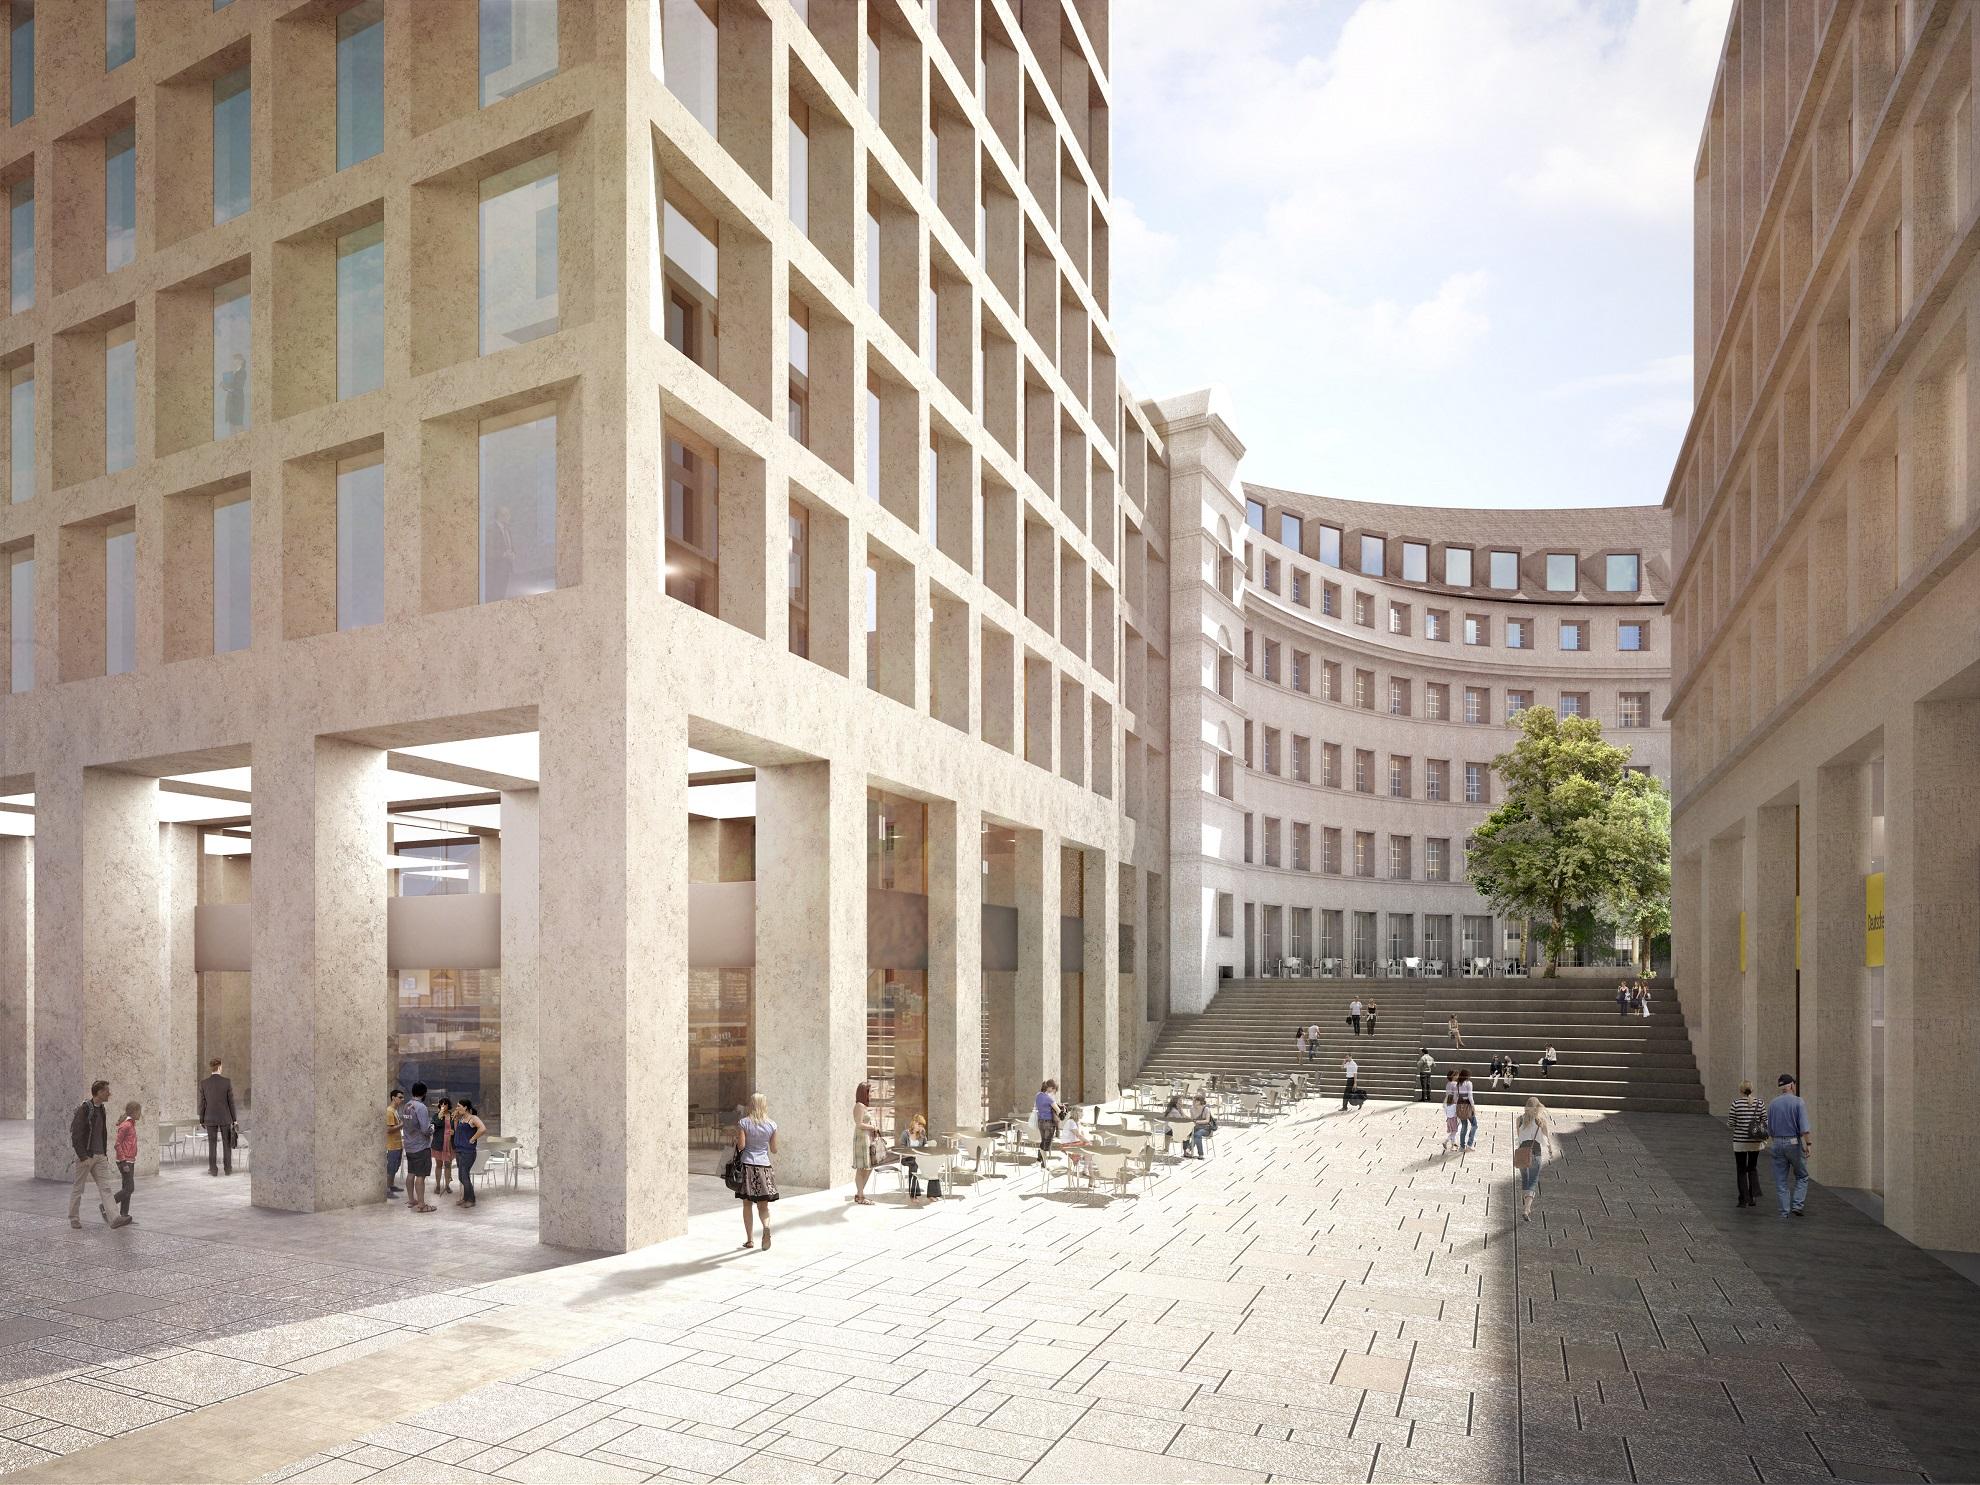 Weiterer hotelzugang muenchenarchitektur - Architekturburo berlin ...